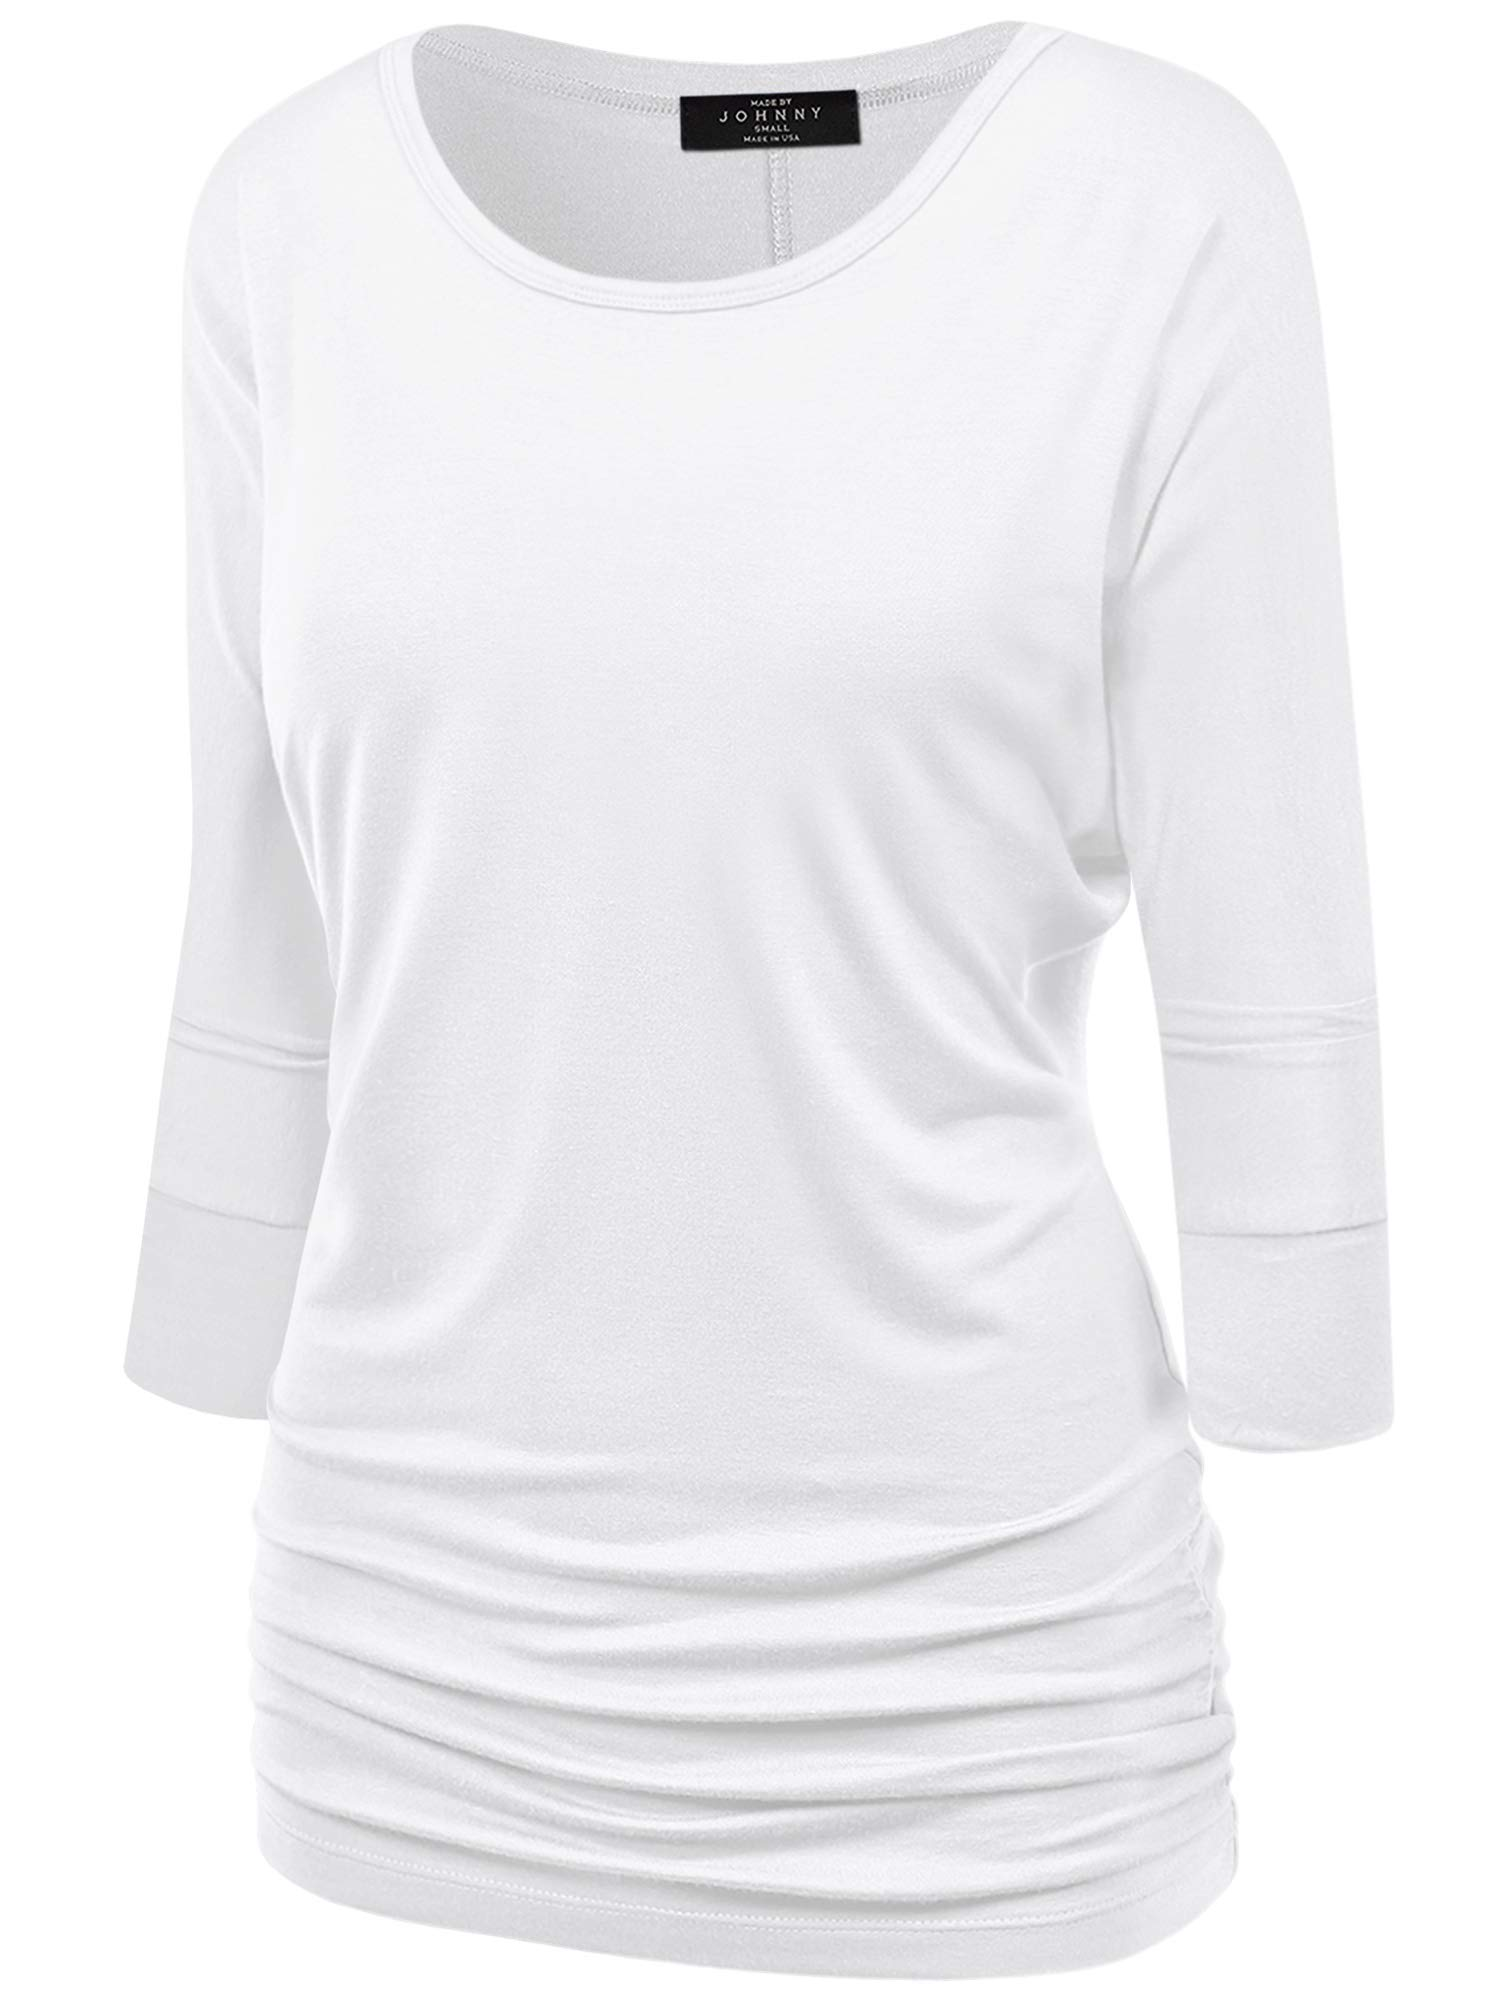 Women's V-Neck/Boat Neck 3/4 Sleeve Drape Dolman Shirt Top with Side Shirring